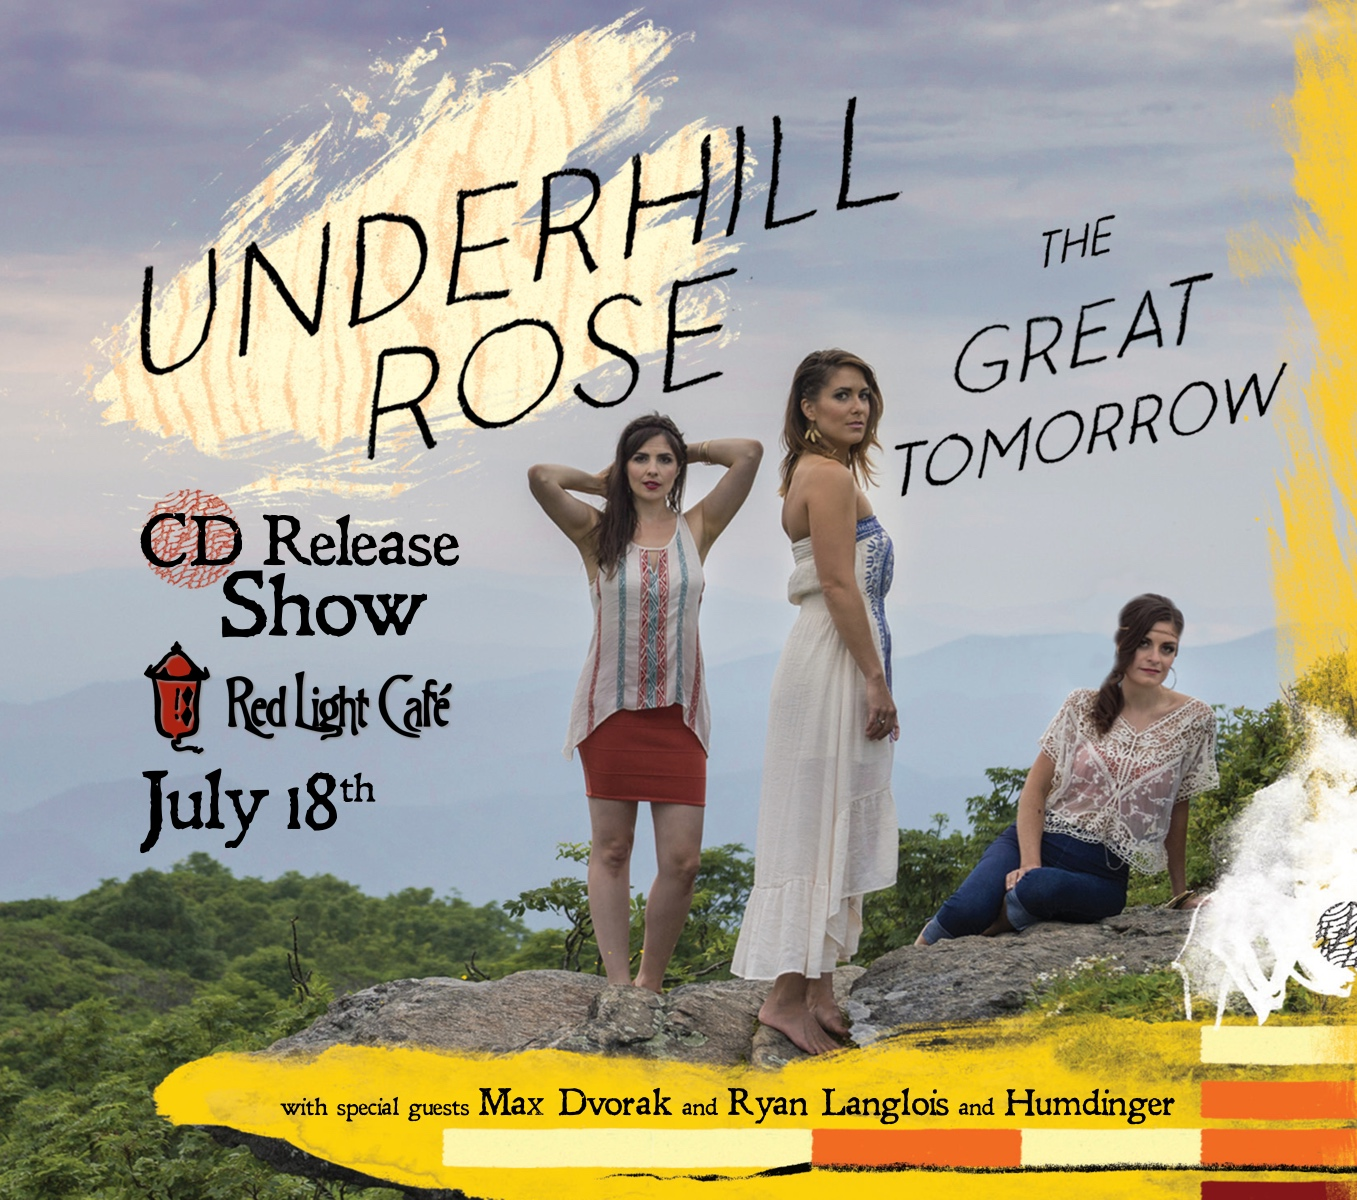 Underhill Rose CD RELEASE SHOW w/ Max Dvorak + Ryan Langlois + Humdinger — July 18, 2015 — Red Light Café, Atlanta, GA